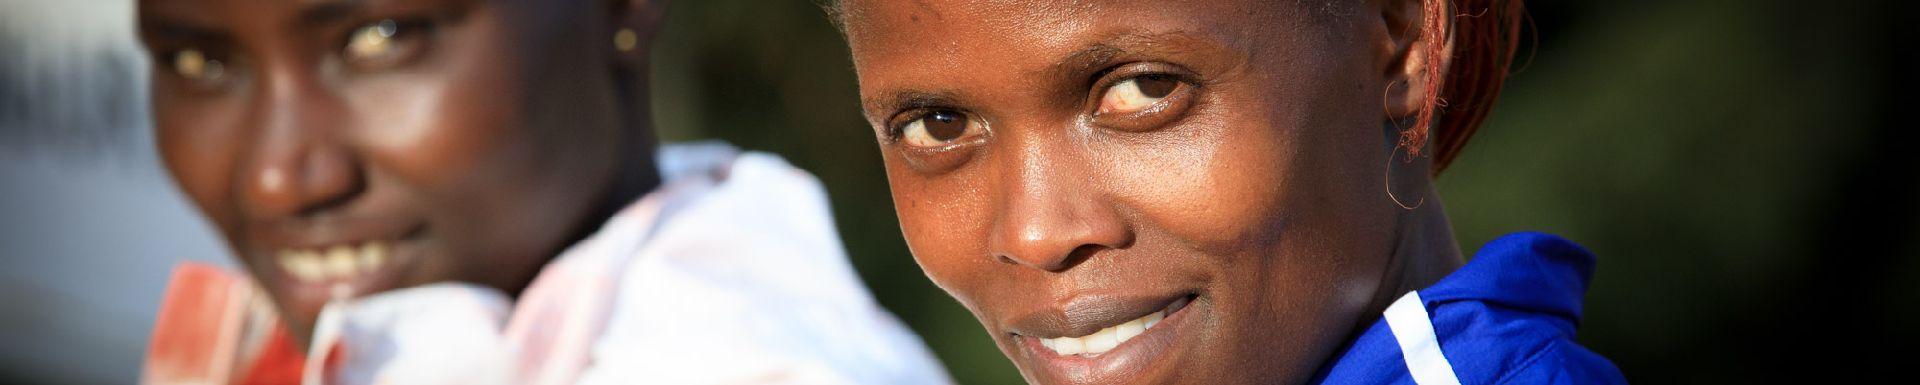 Reportage in Kenia  mit Brigid Kosgei